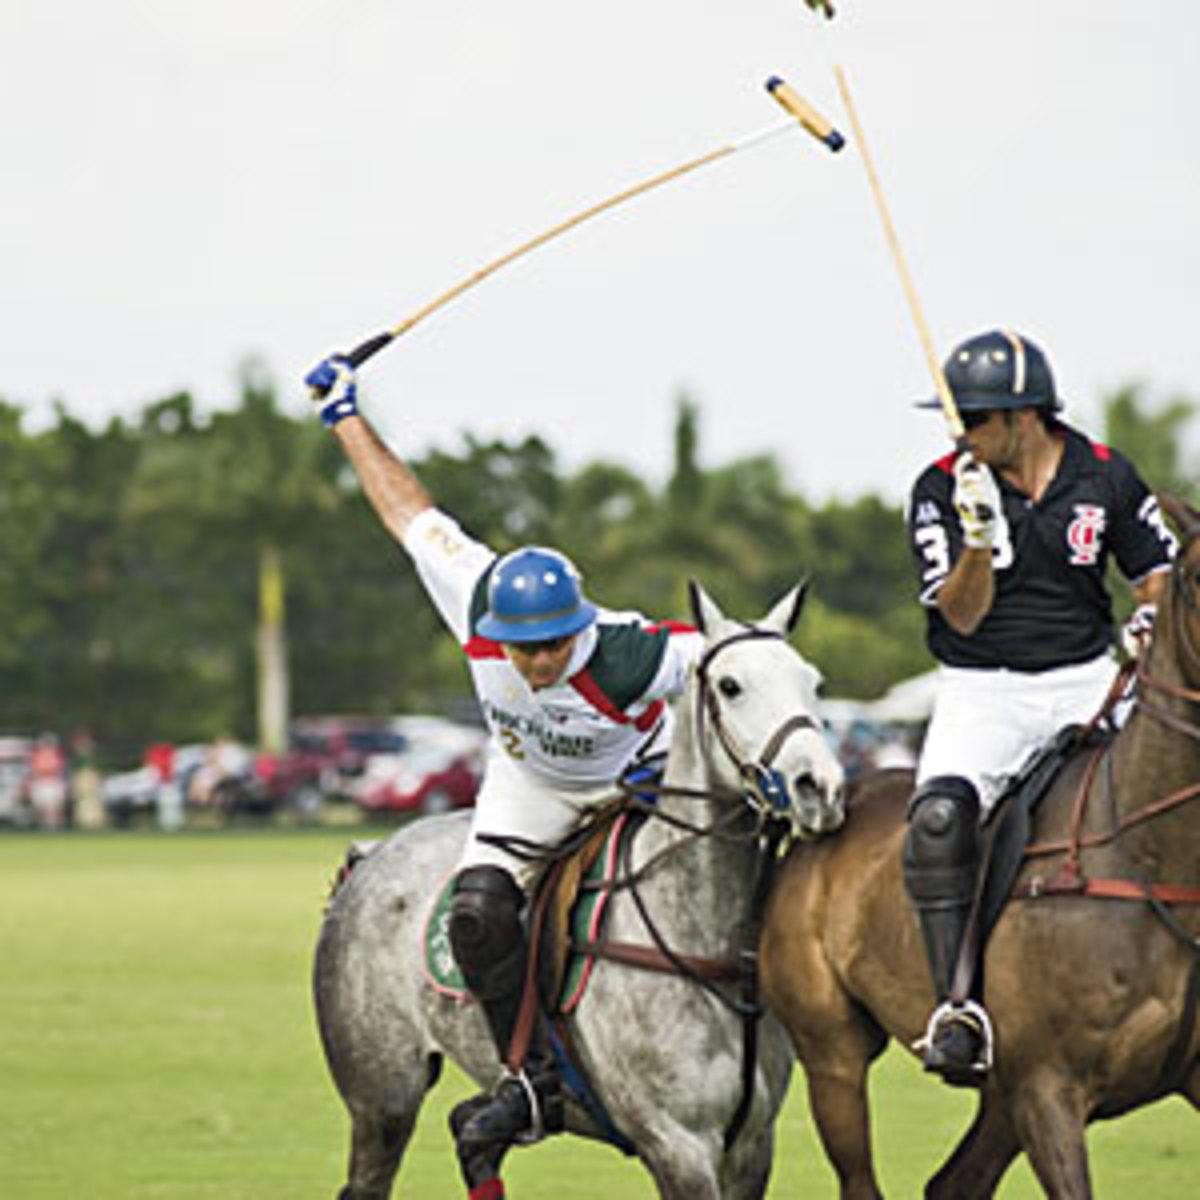 Polo Match, West Palm Beach, Florida